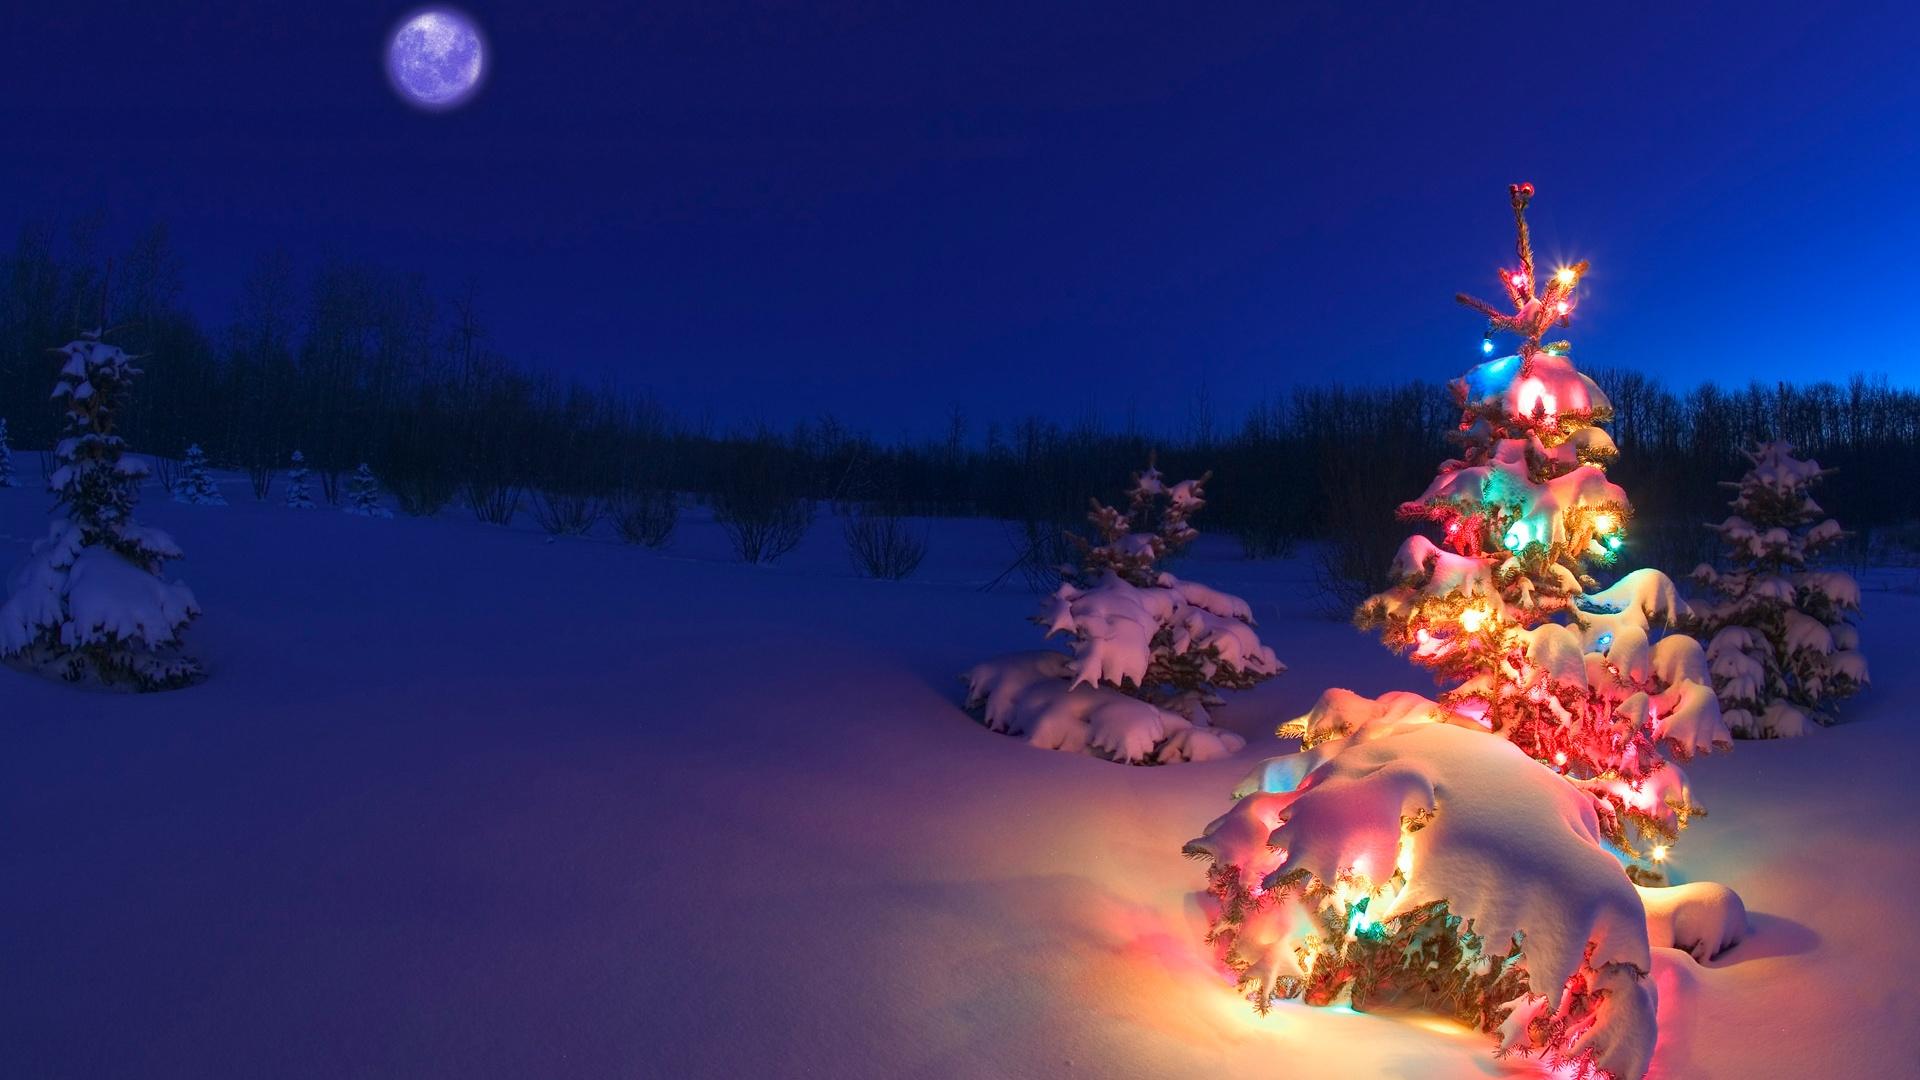 Xmas Tree Hd Wallpaper Hd Christmas Wallpapers Pixelstalk Net